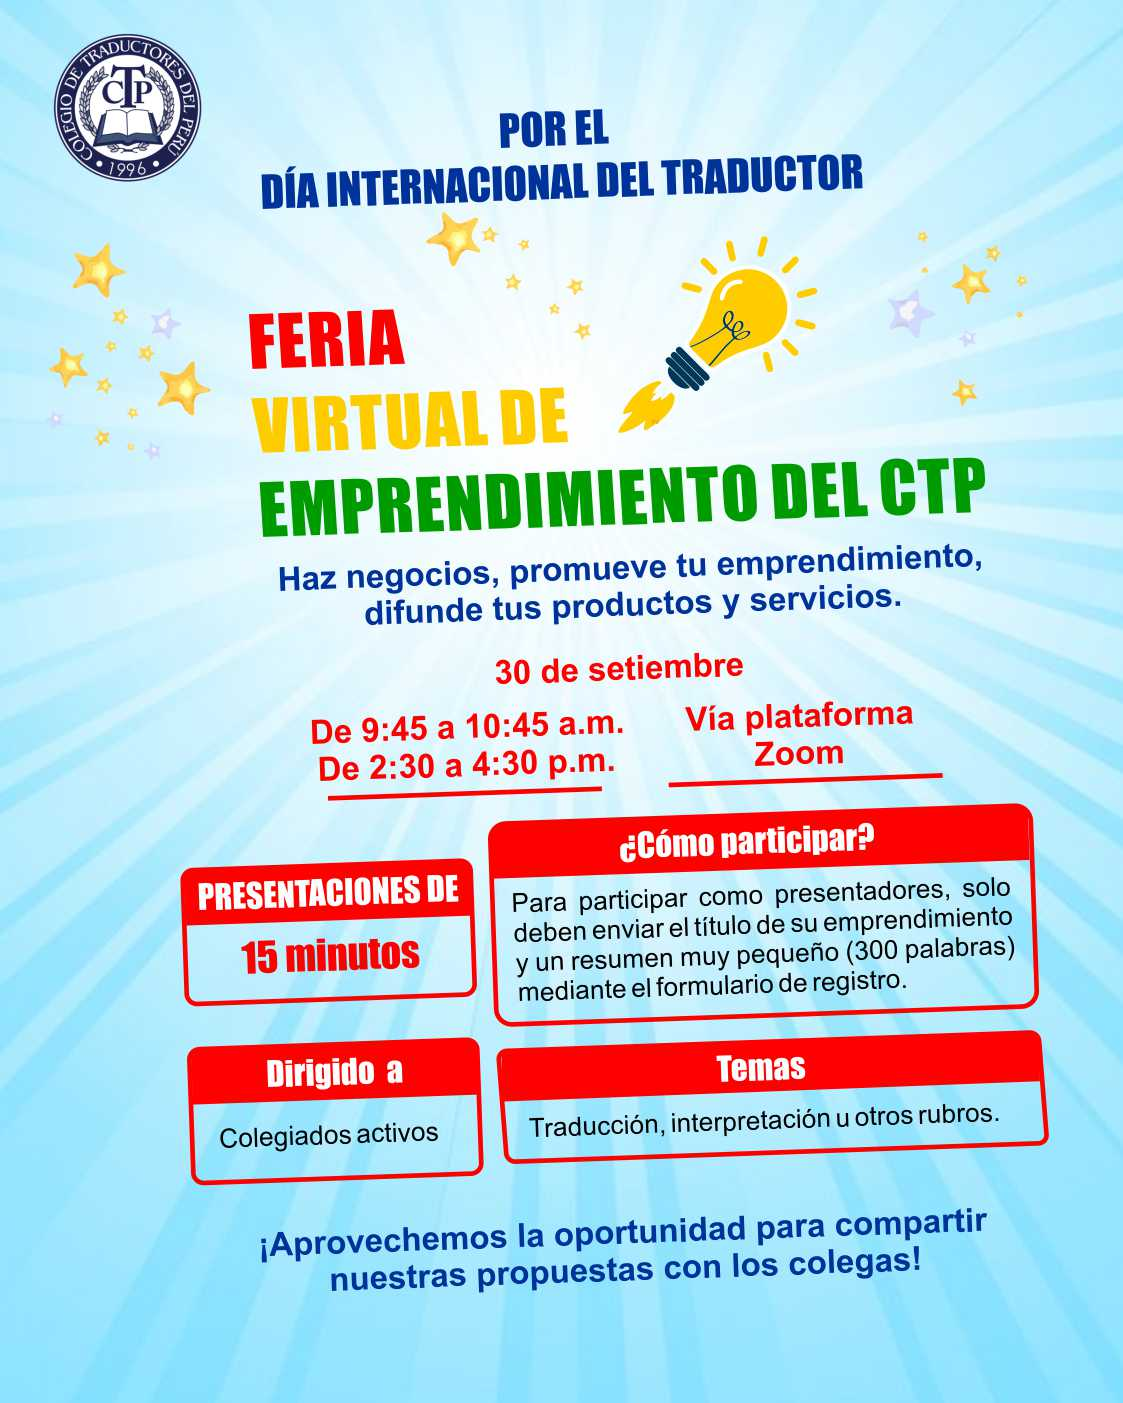 https://campaign-image.com/zohocampaigns/688848000000588006_1_1600976357533_feria-de-emprendimiento-ctp.jpg